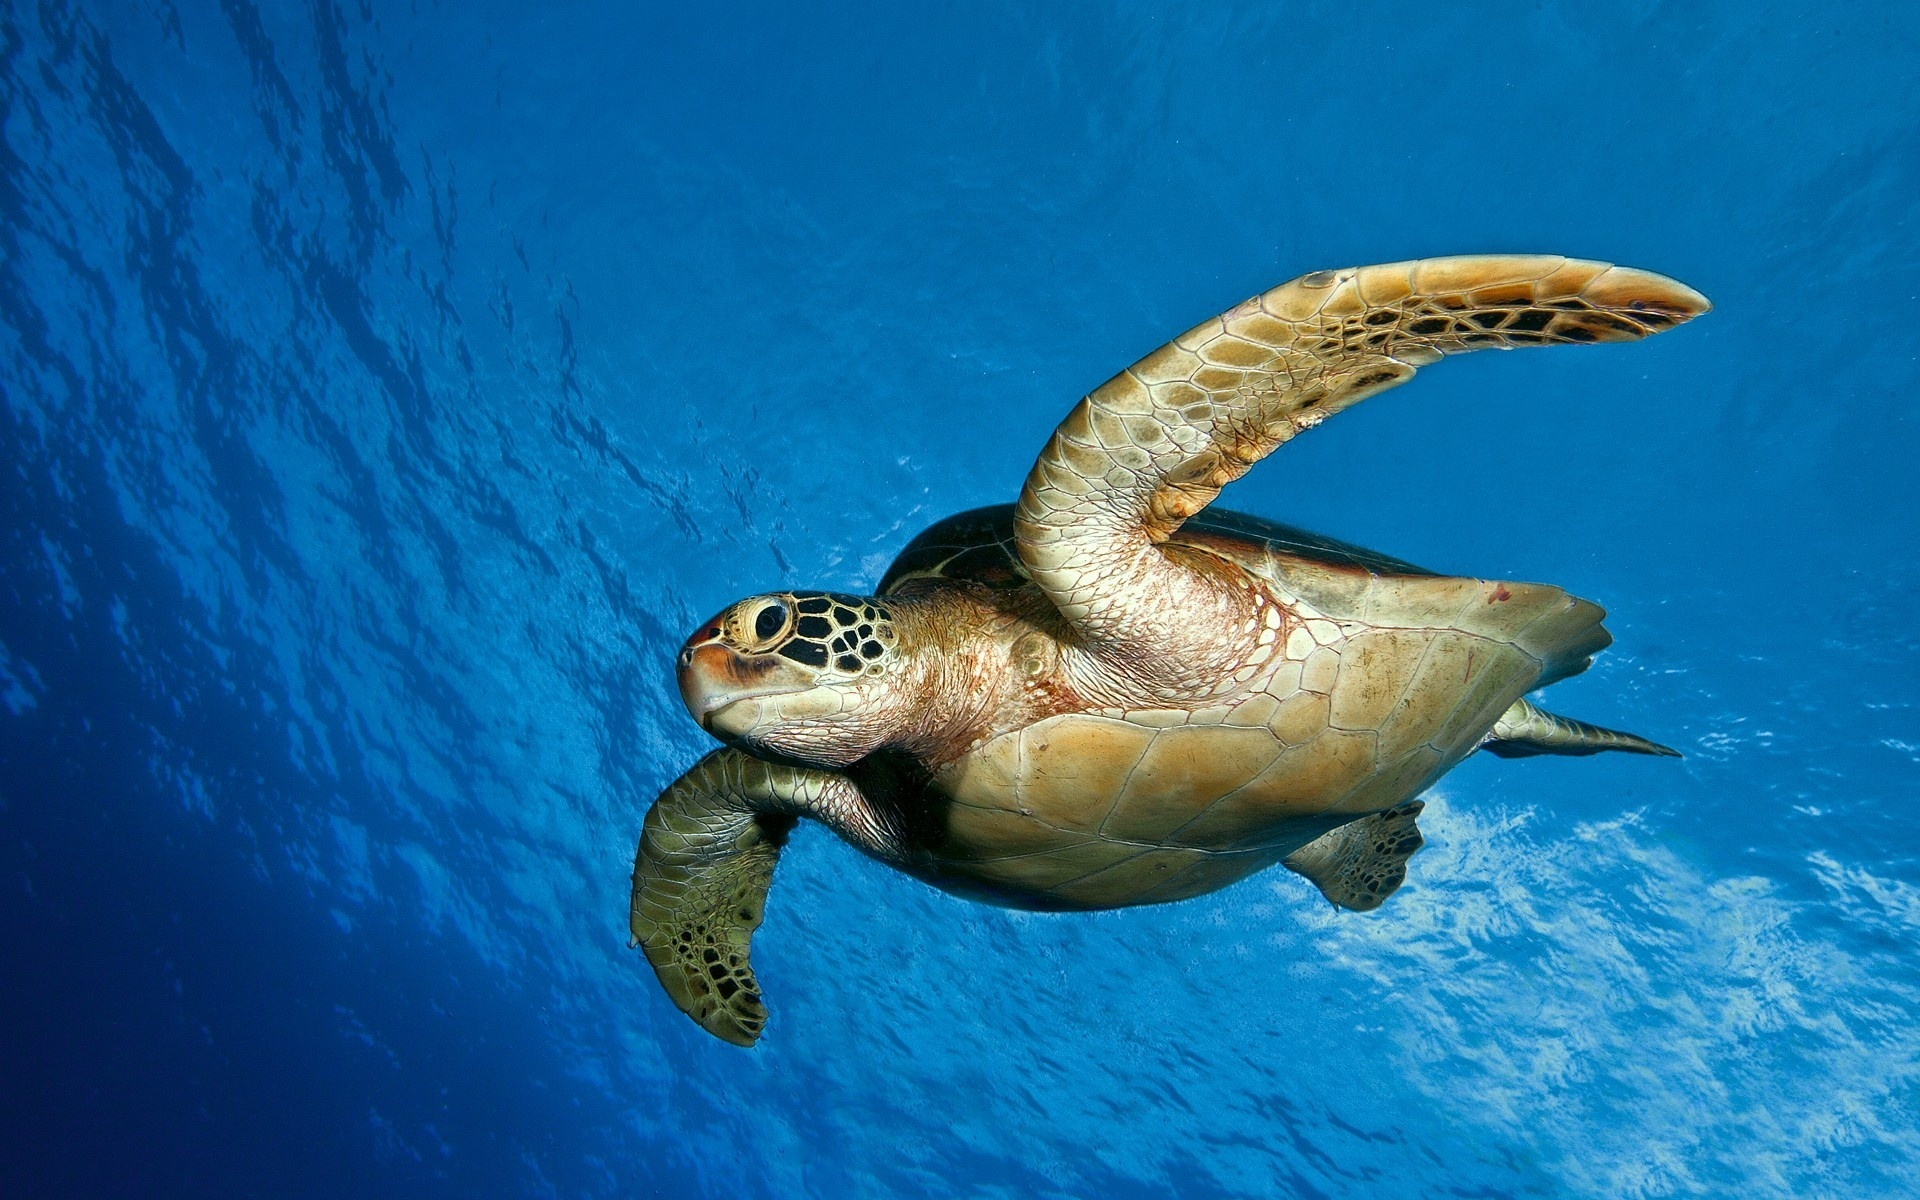 sea turtle wallpaper 4518 1920x1200 px hdwallsource